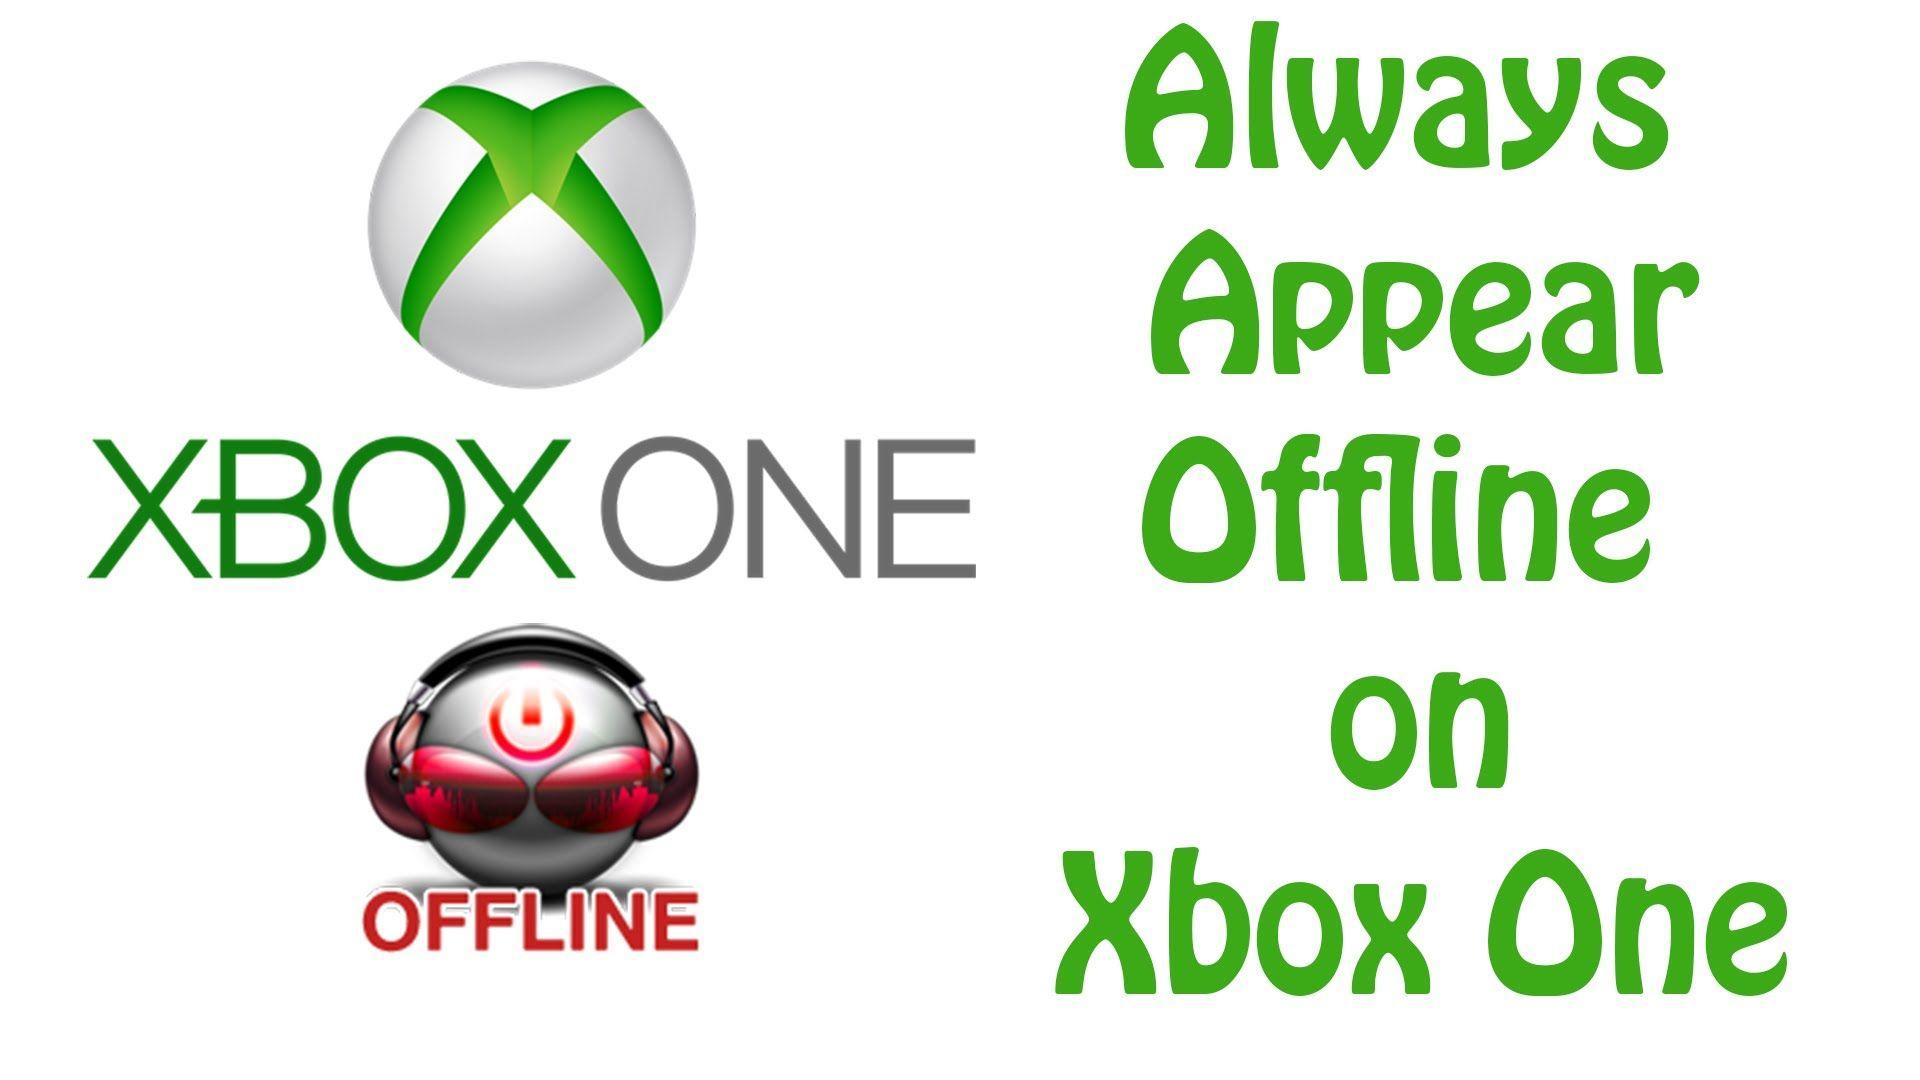 Xbox One Tutorial How To Always Appear Offline Xbox